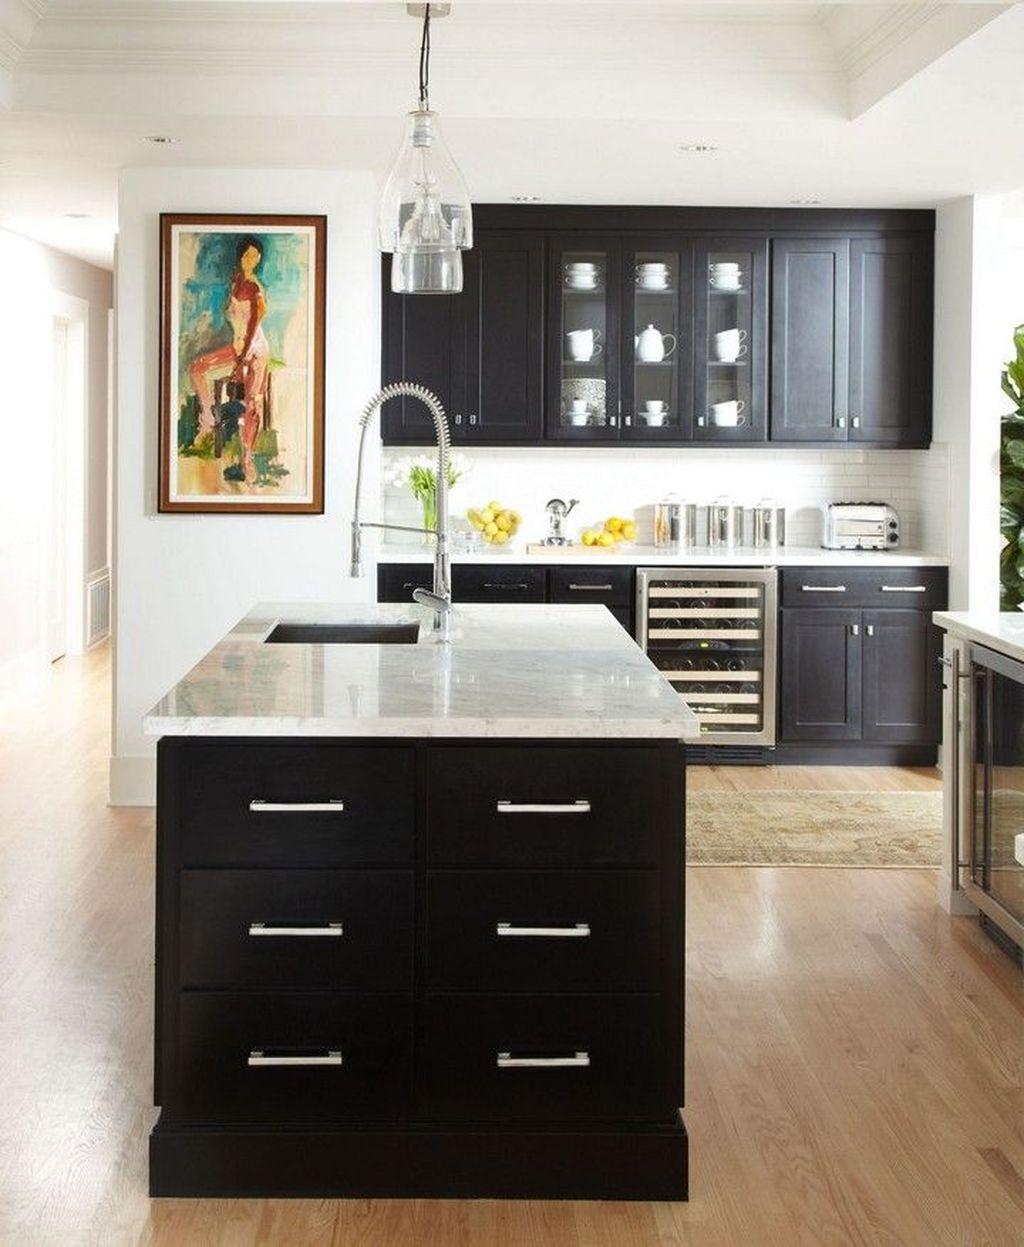 Fabulous Black And White Wood Kitchen Design Ideas 26